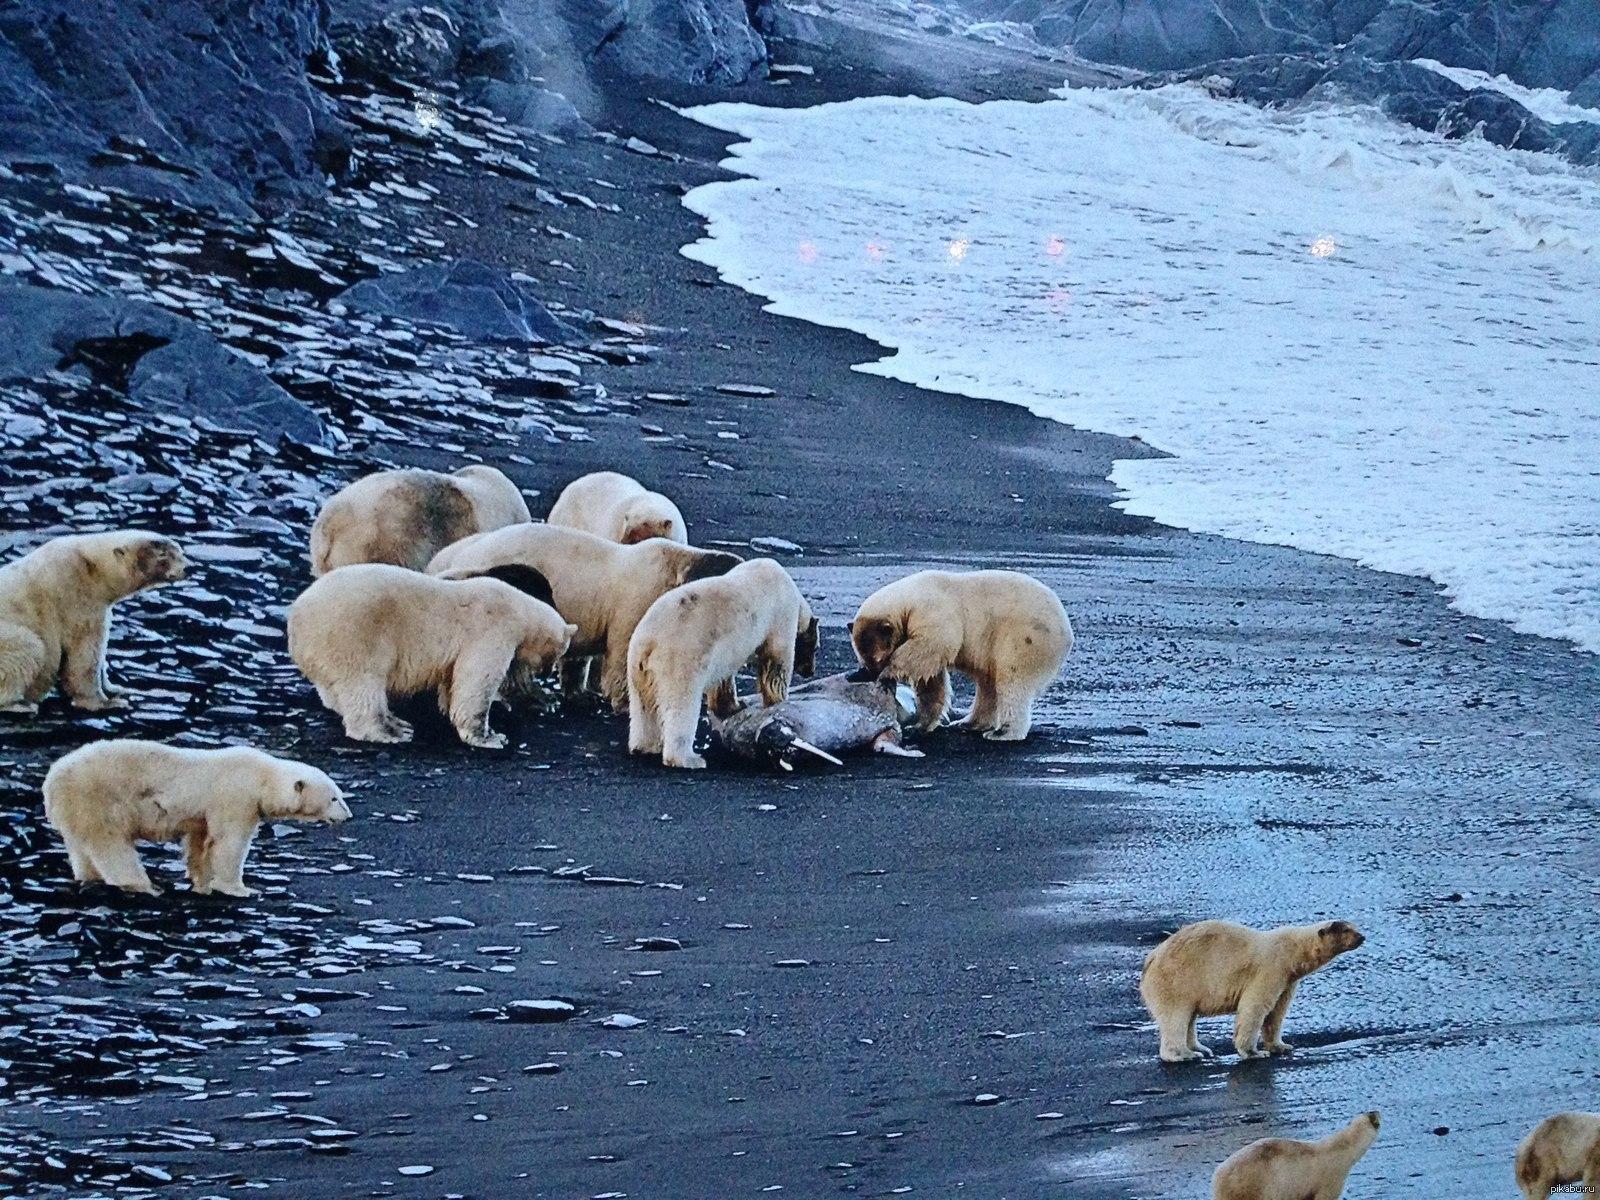 картинка как животные помогают друг другу краска